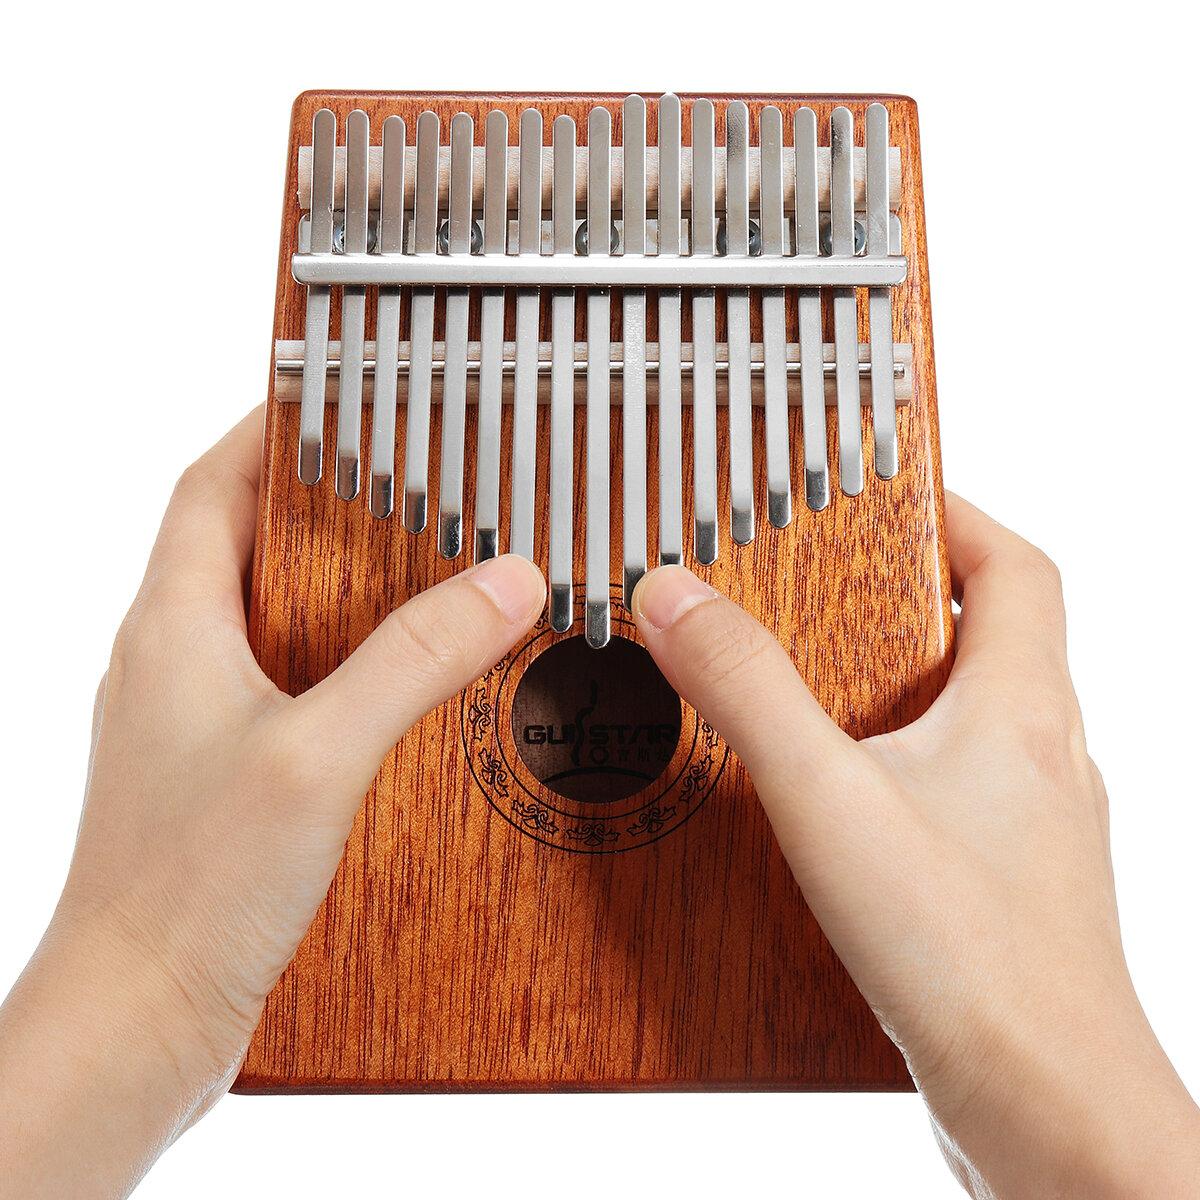 17 Keys Wood Kalimbas Mahogany Thumb Piano Finger Percussion With Tuning Hammer